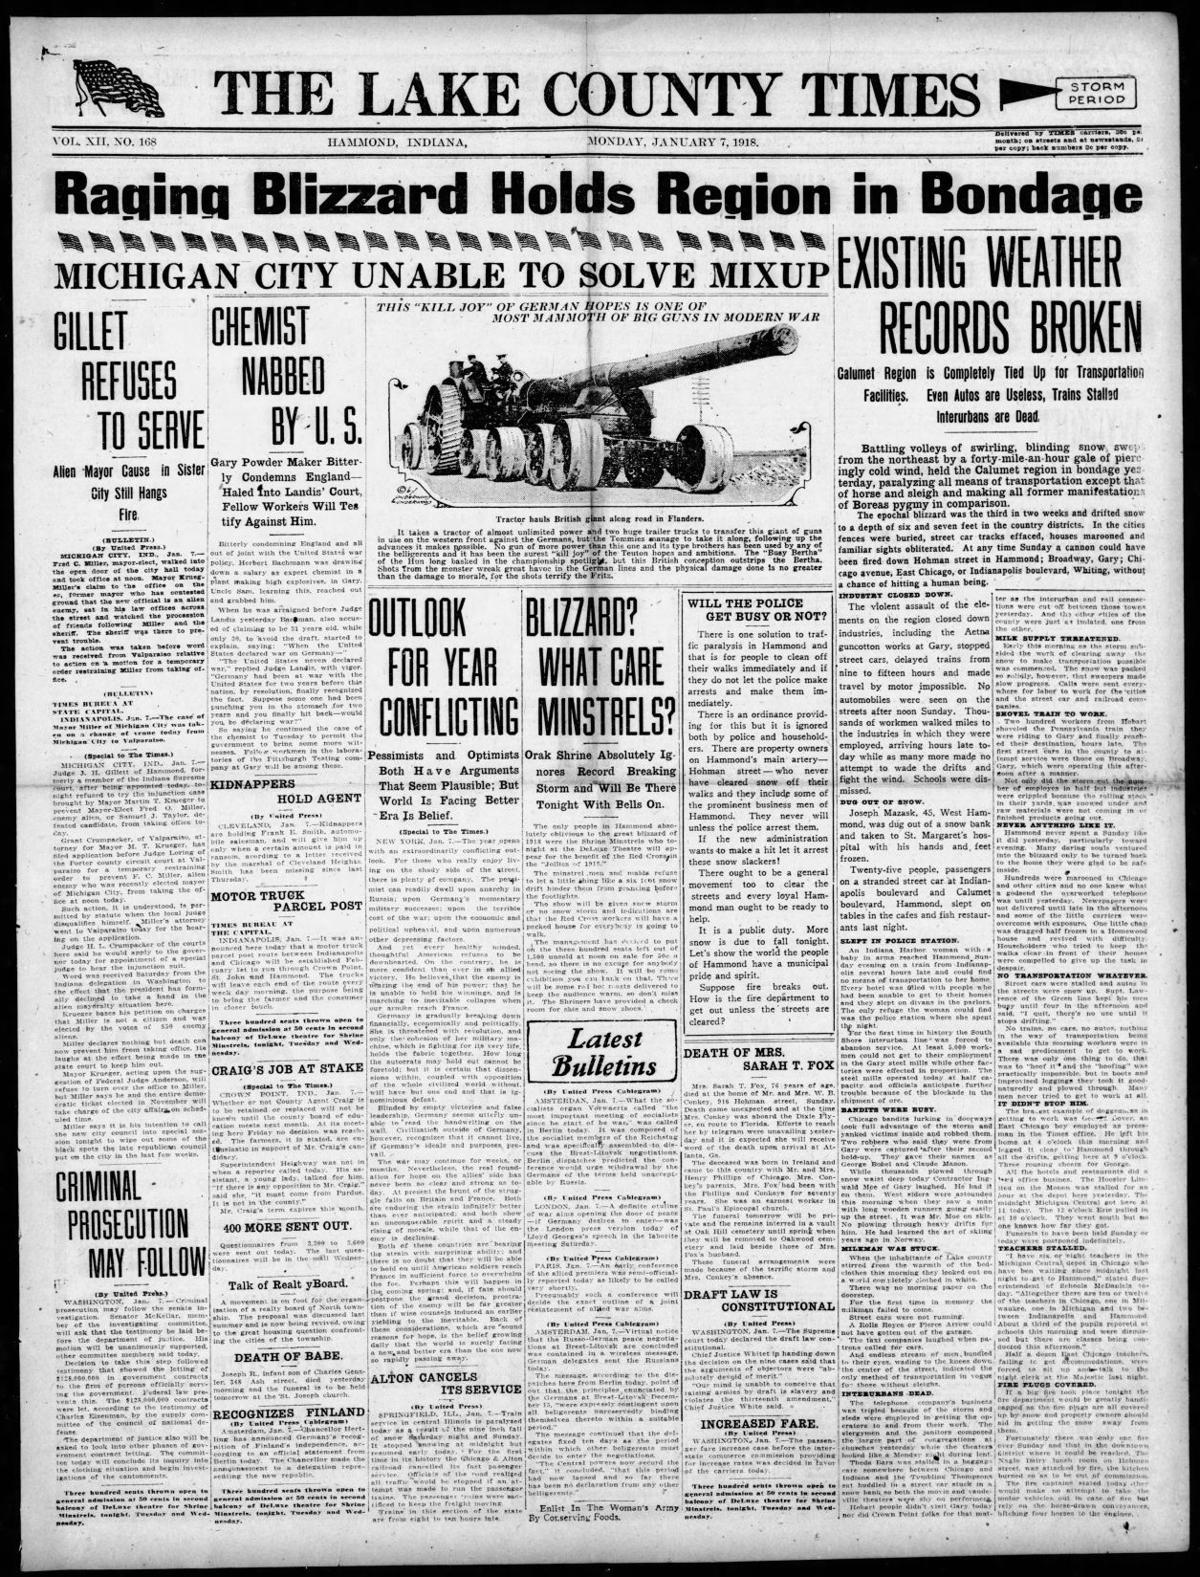 Jan. 7, 1918: Raging Blizzard Holds Region in Bondage